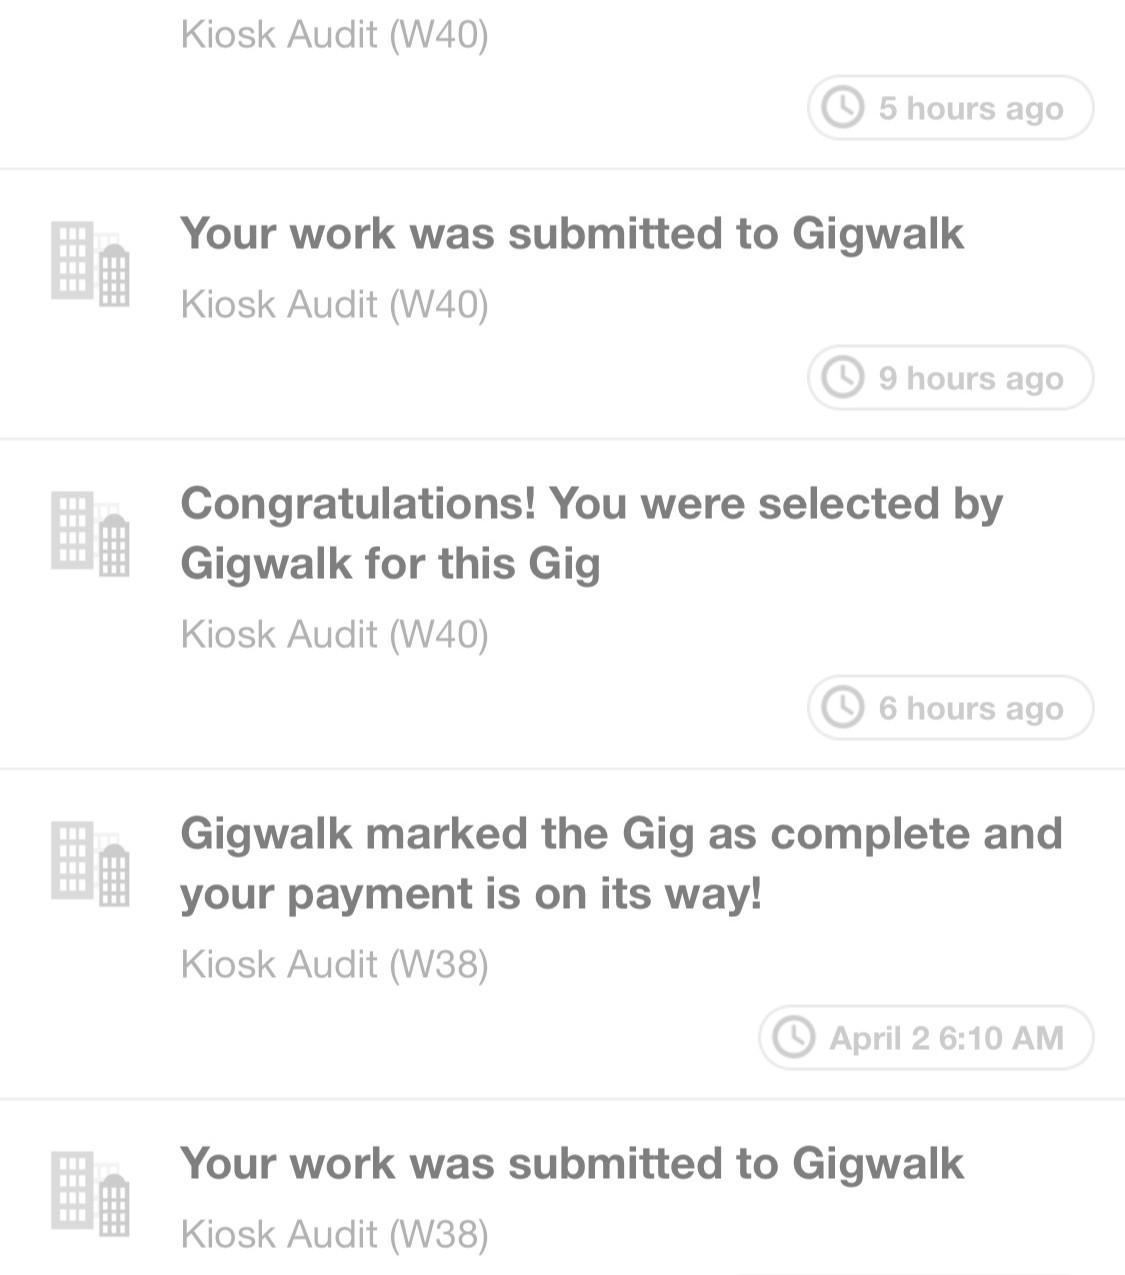 Gigwalk activity